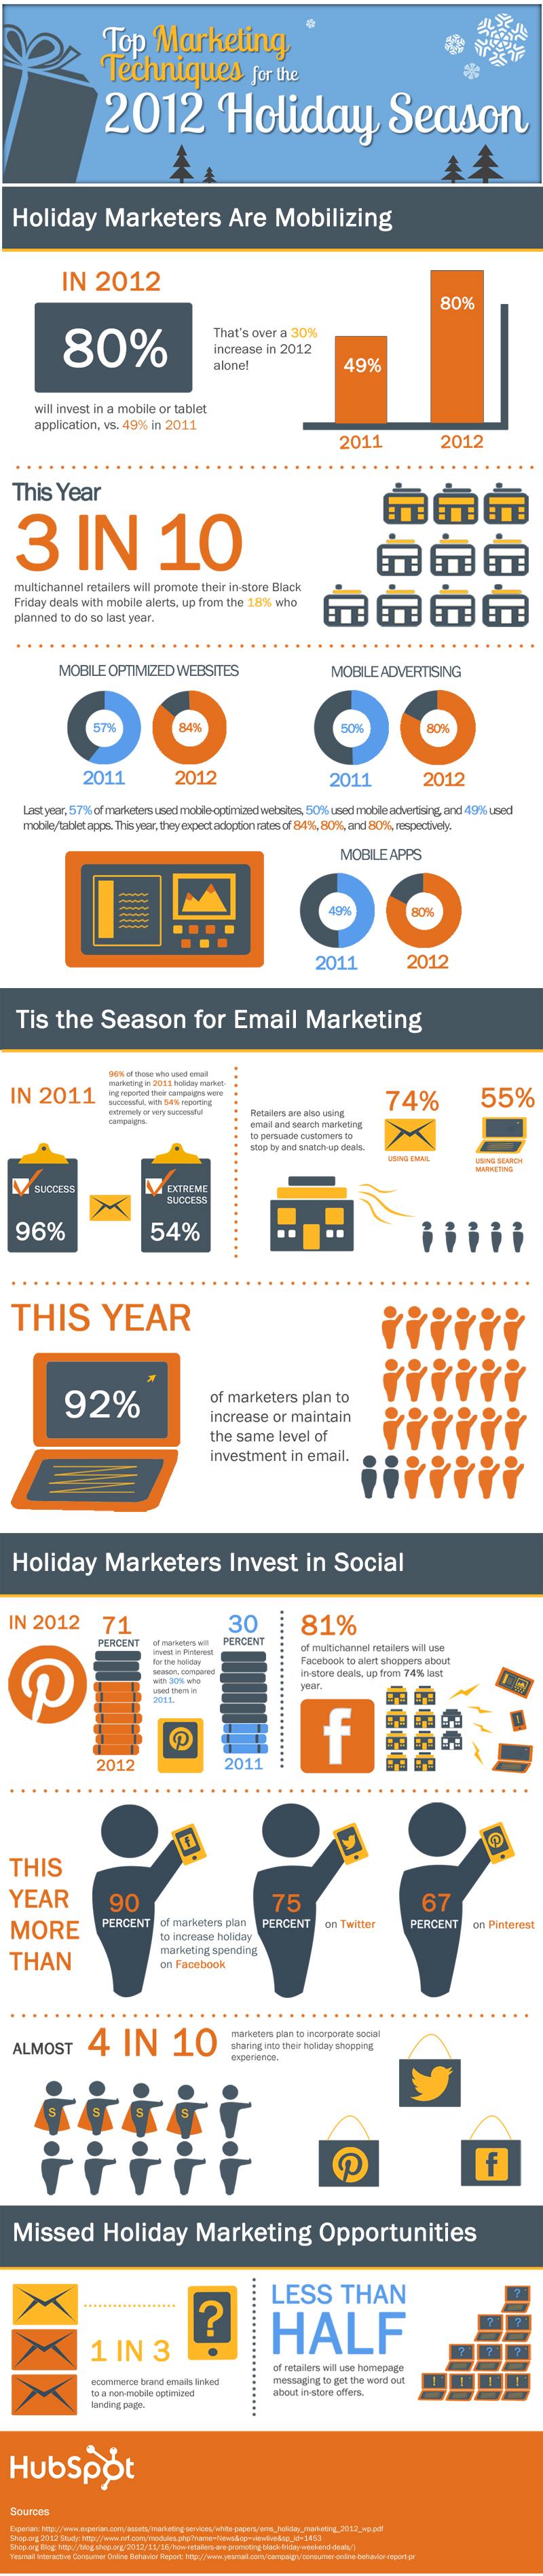 2012 holiday marketing stats